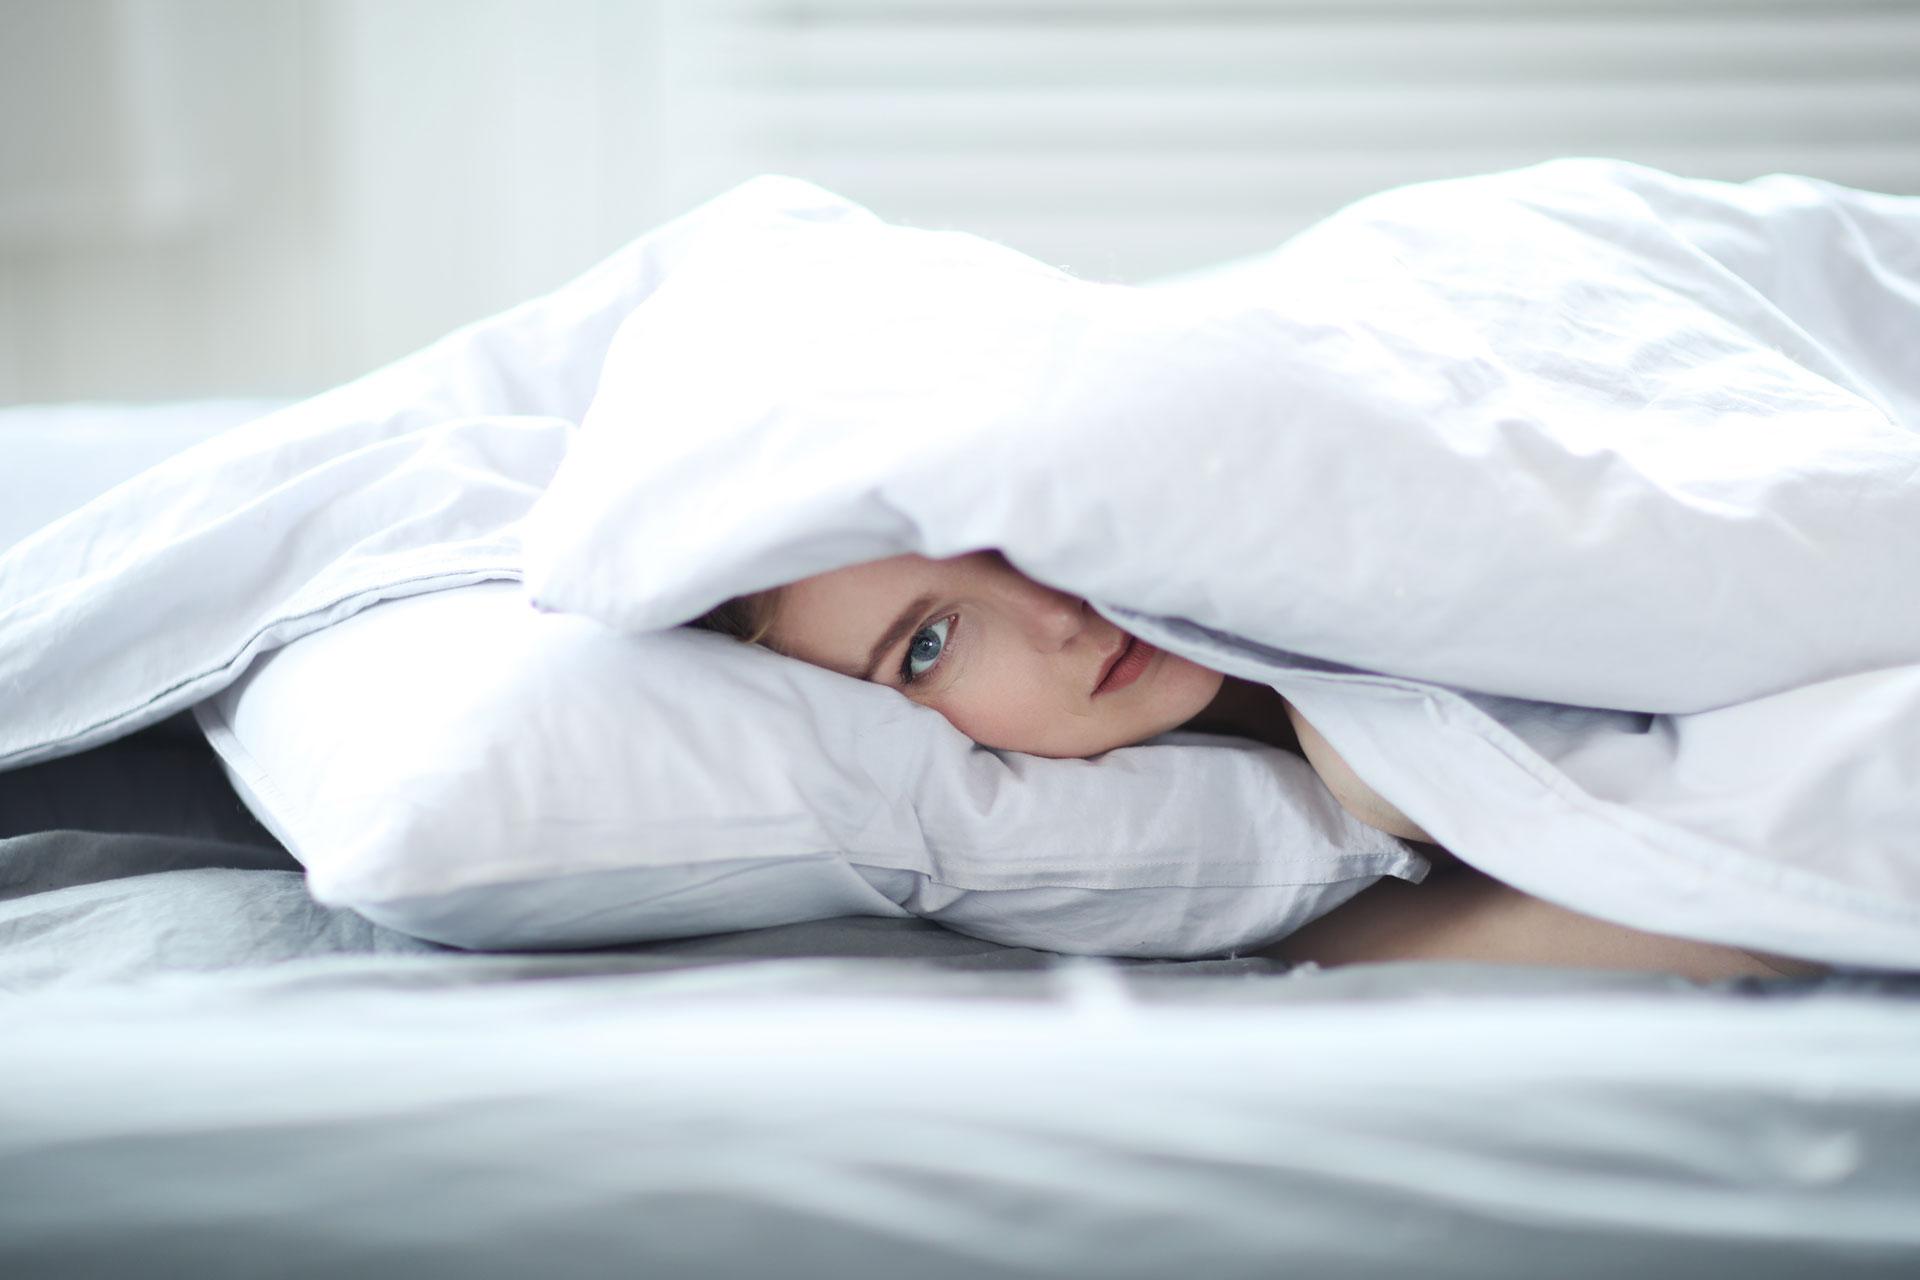 Decak ispod jorgana lezi na jastuku